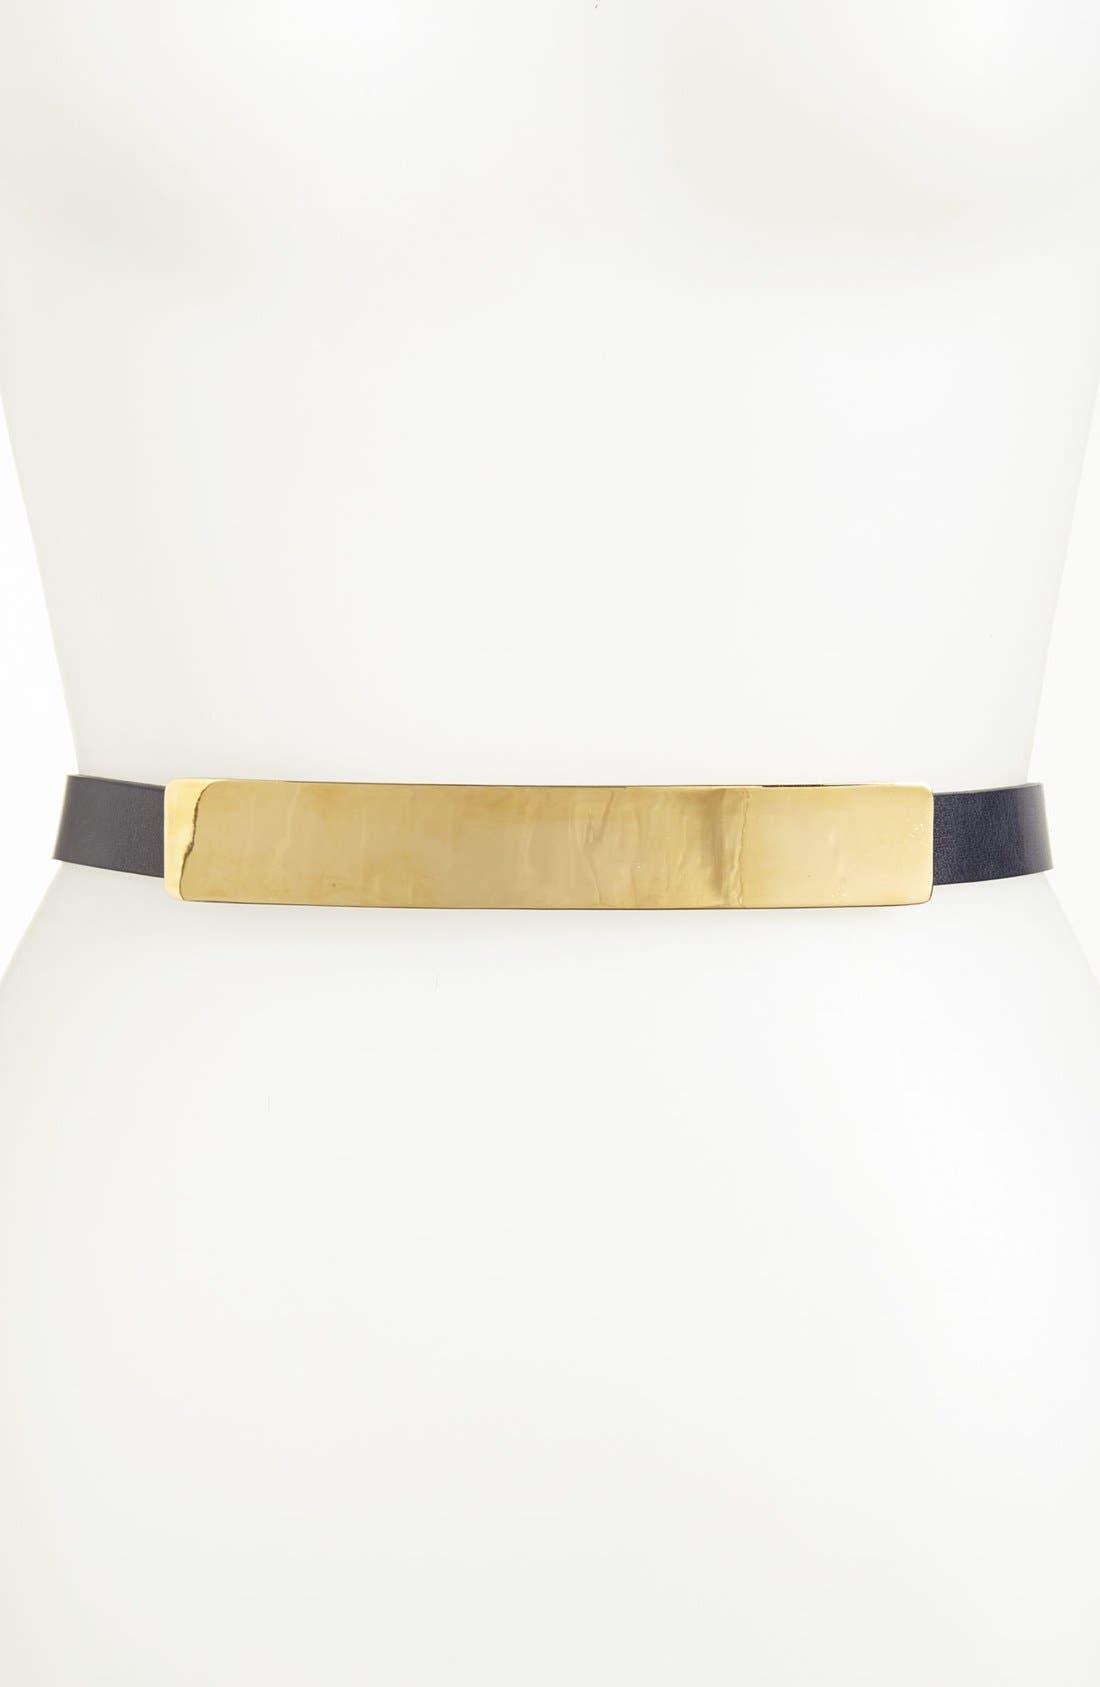 Main Image - St. John Collection Light Gold Buckle Leather Belt